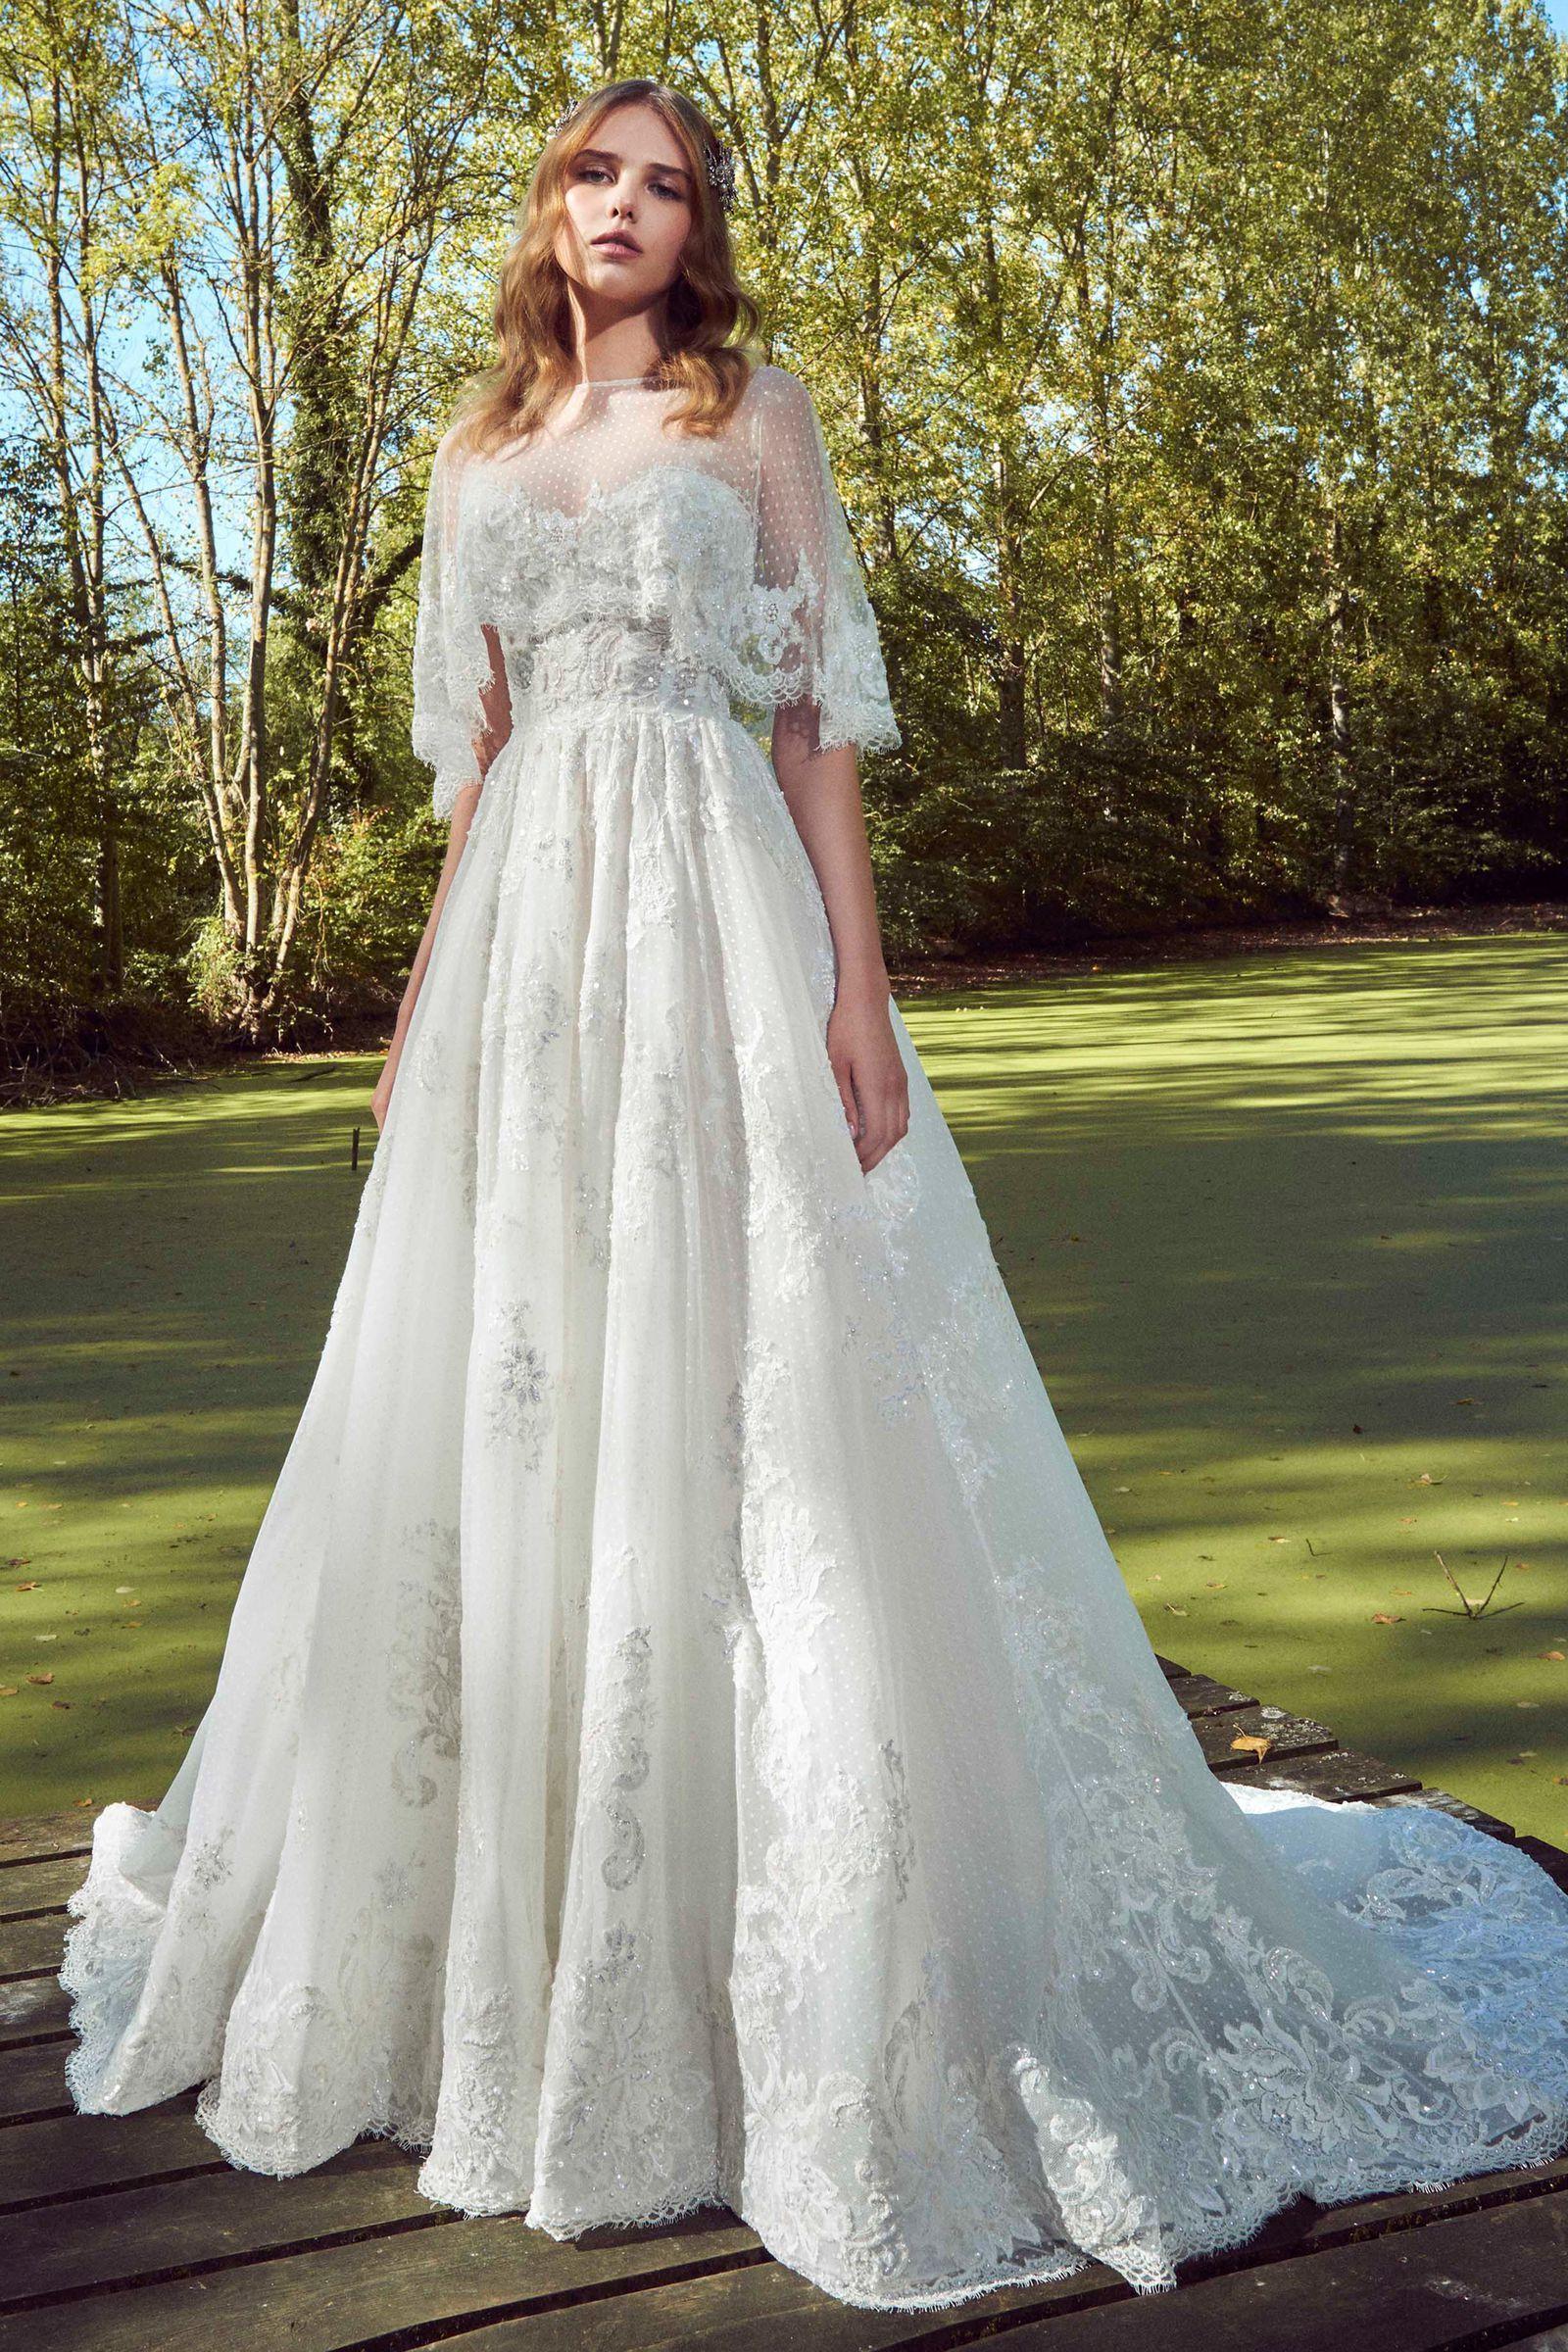 Most Beautiful Wedding Dresses.The Most Beautiful Bridal Dresses Saddha